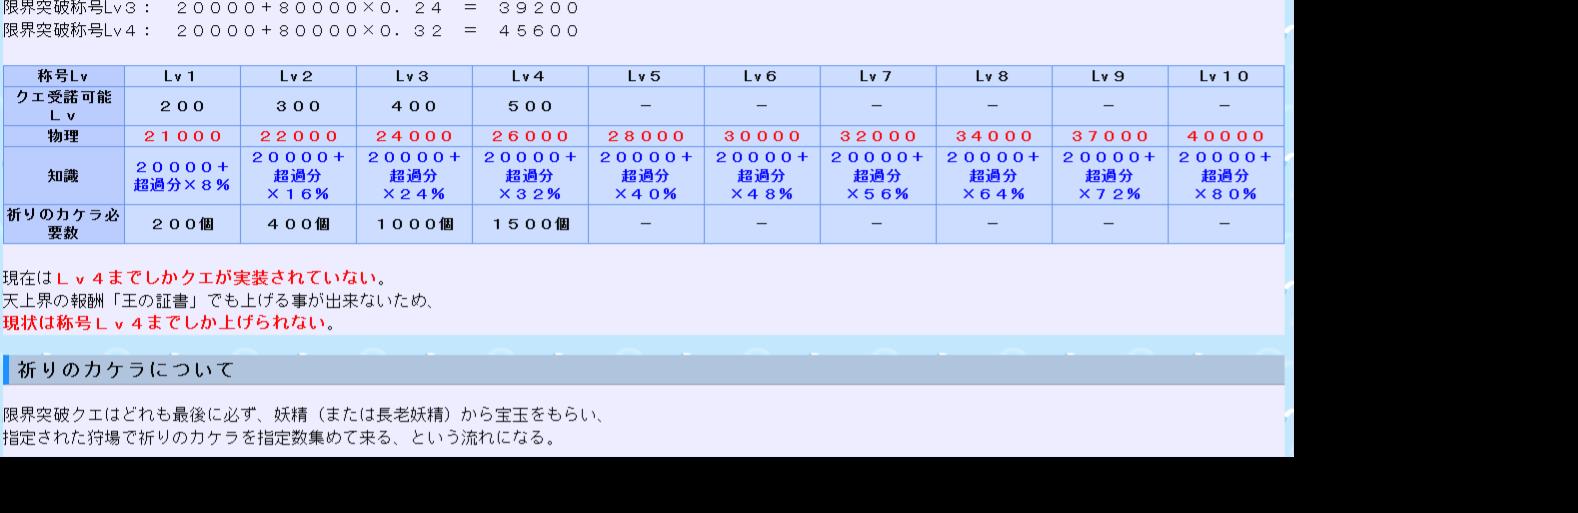 c58098e63418444a2aa7d032adc46caa.png